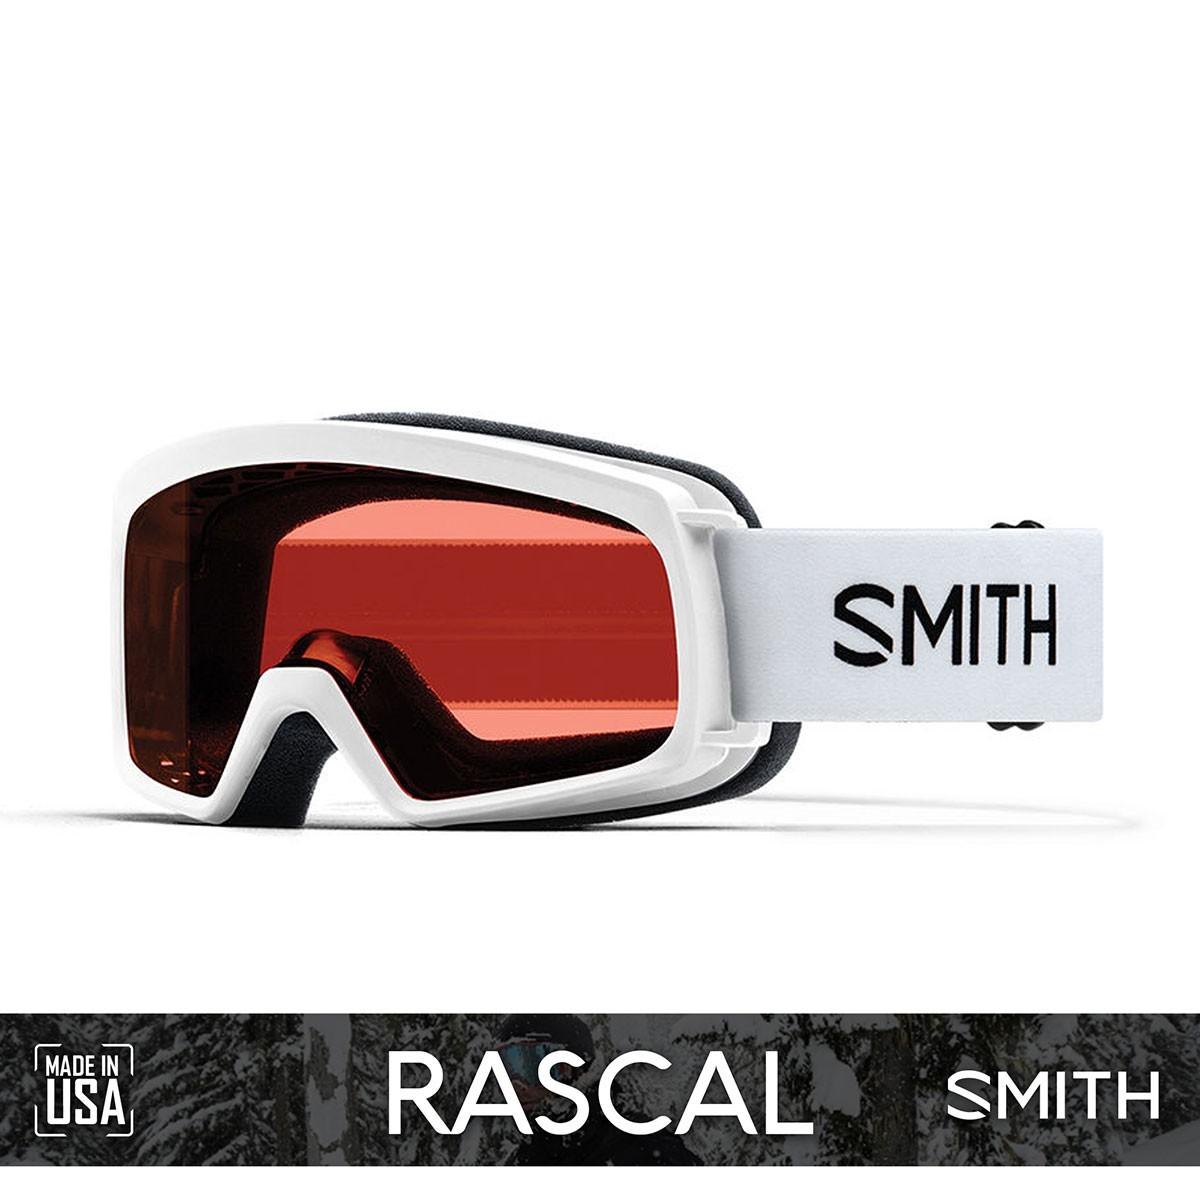 SMITH RASCAL White   S2 RC36 ROSEC - Изображение - AQUAMATRIX